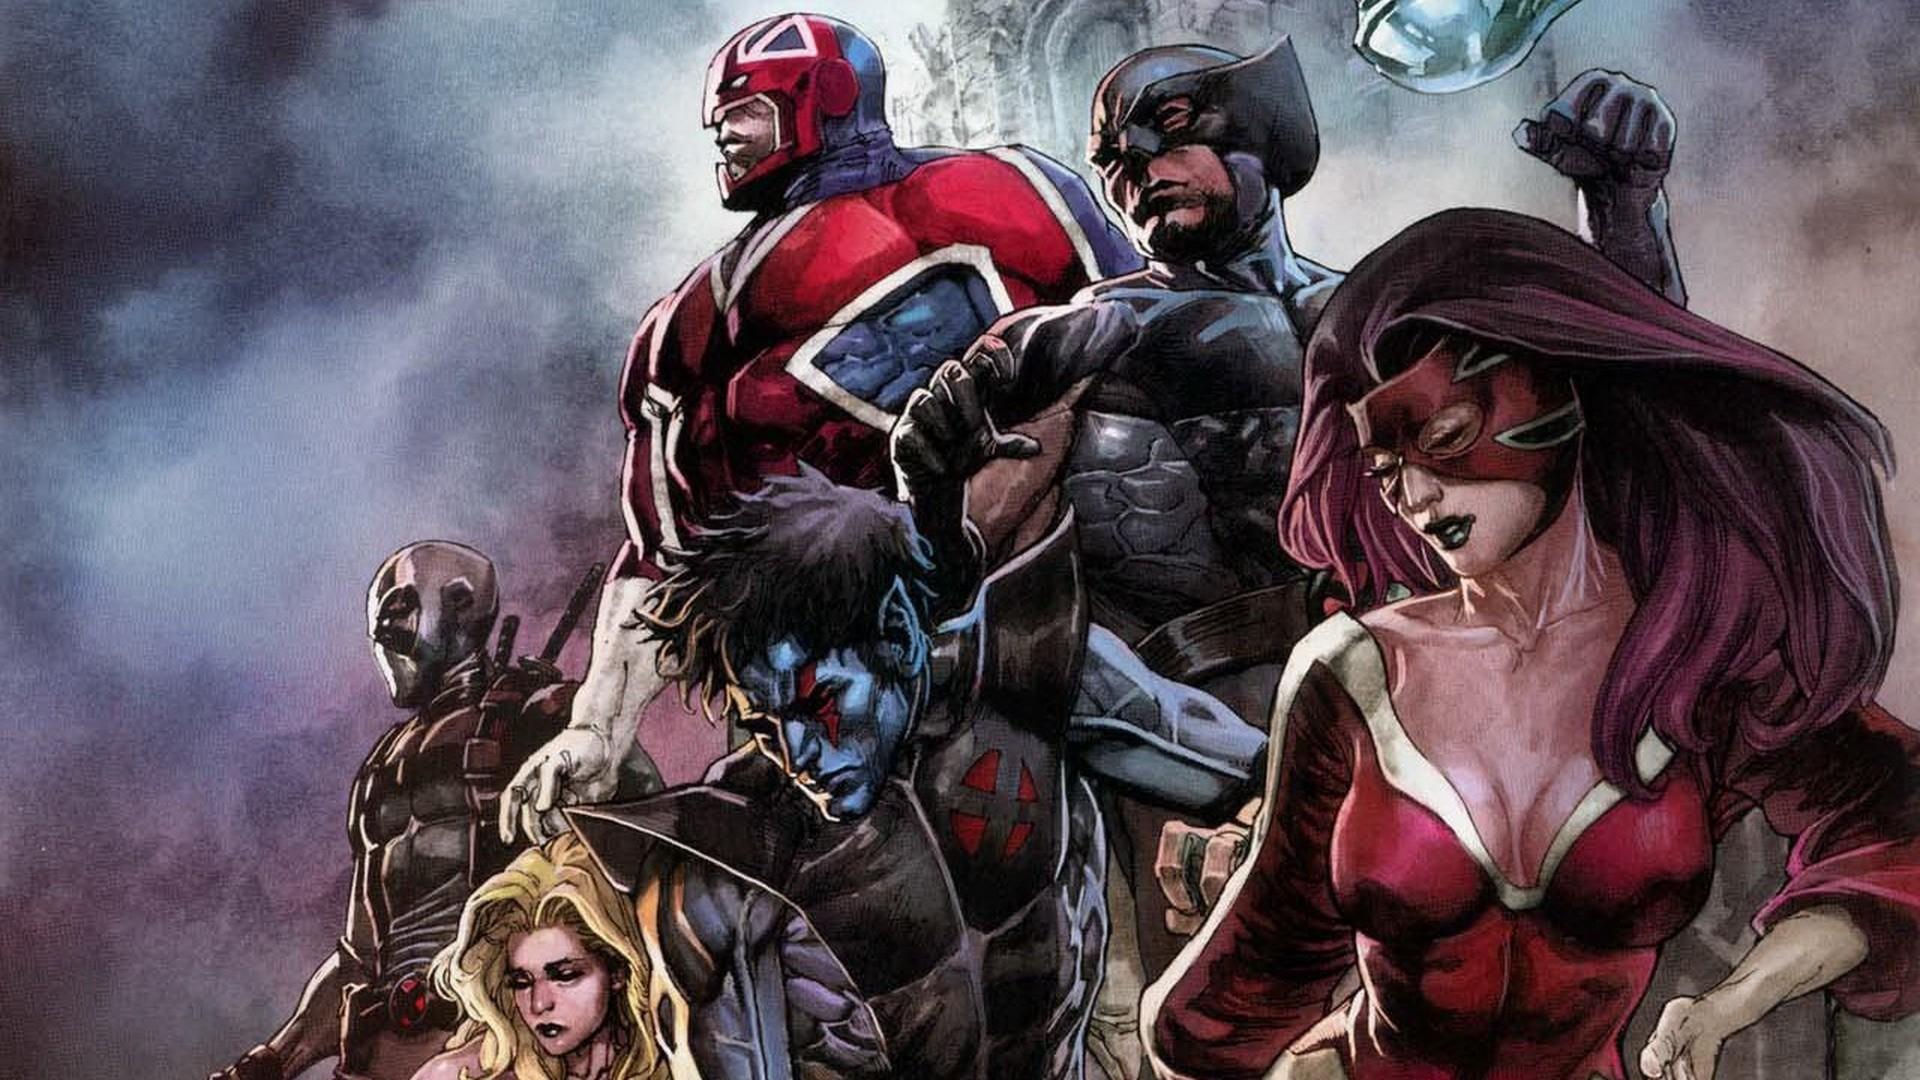 HD wallpaper X-Force Marvel